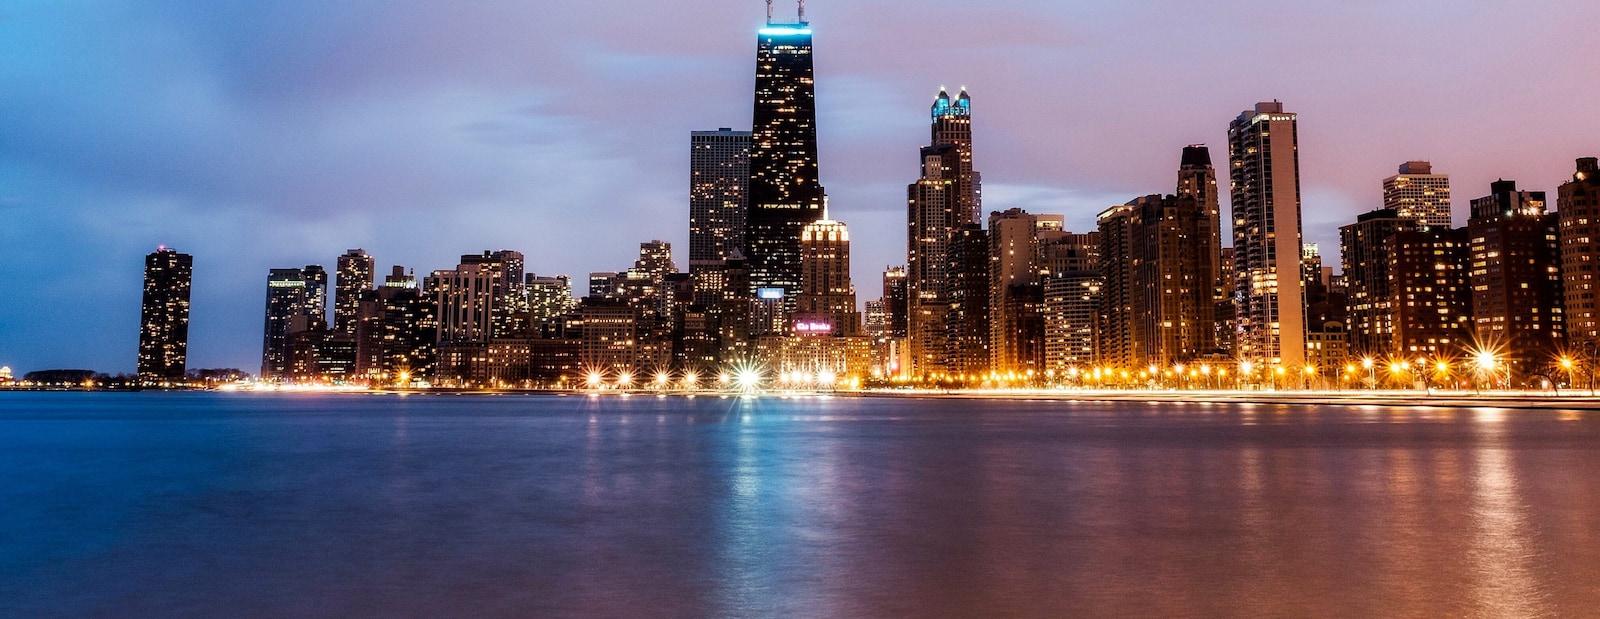 Downtown Chicago的度假屋